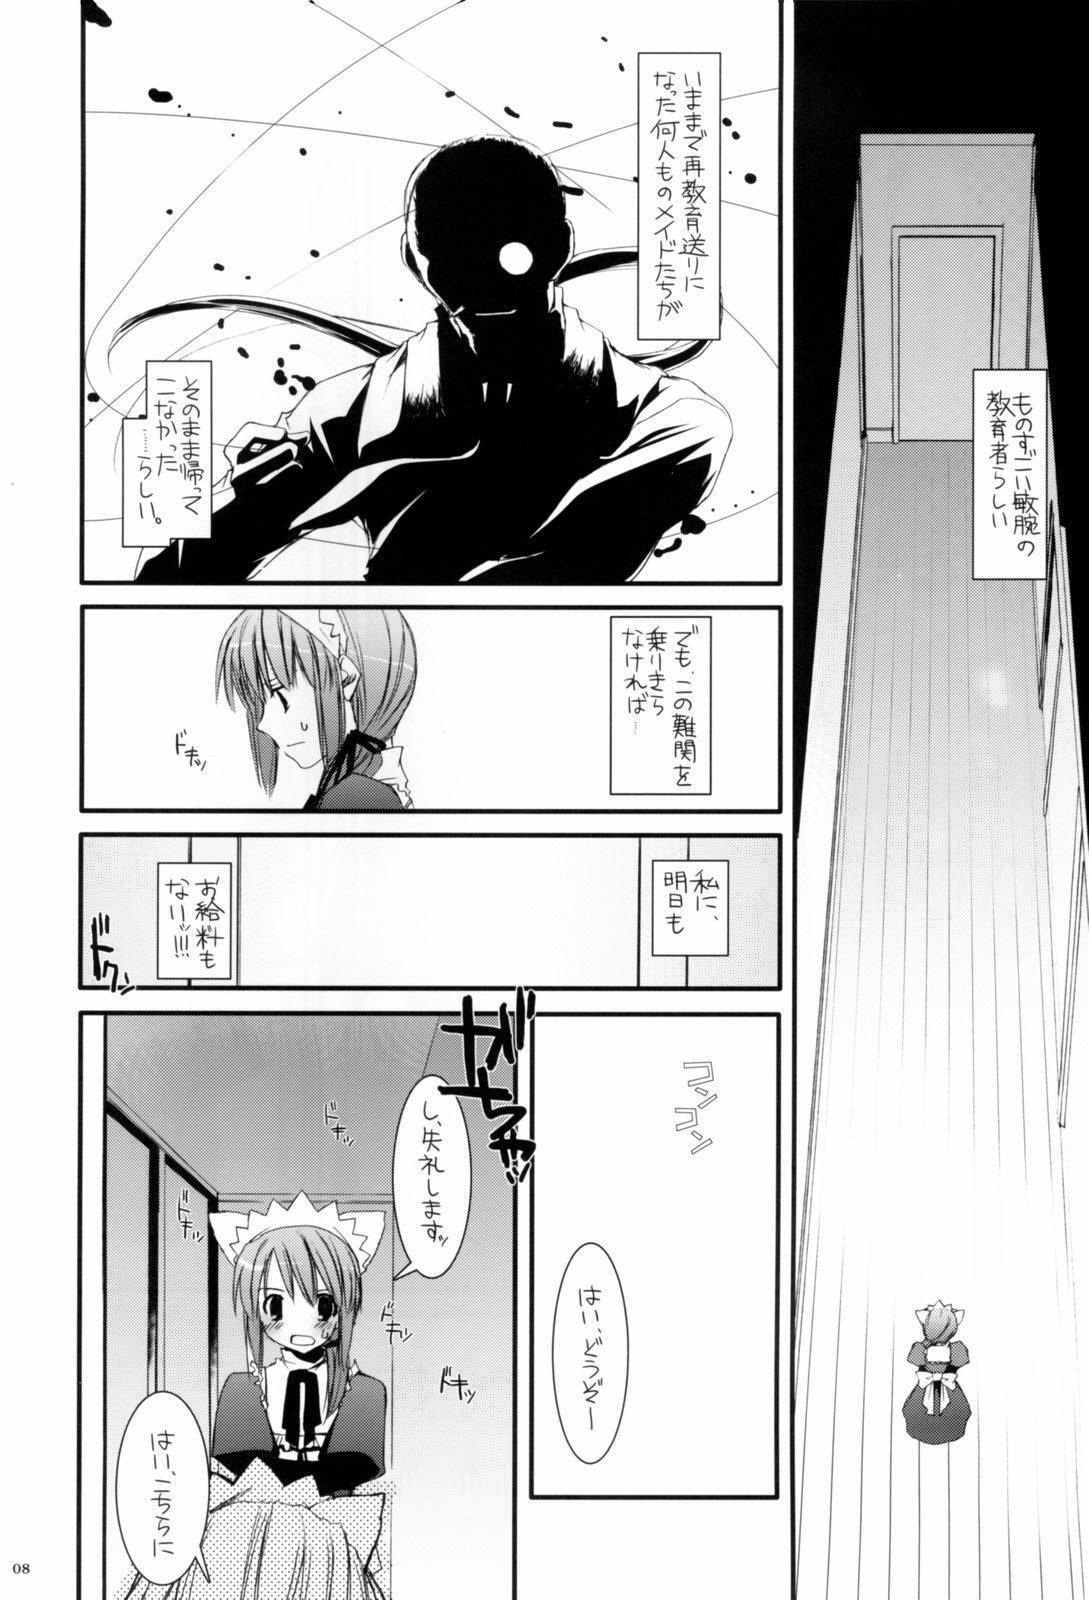 Seifuku Rakuen 13 - Costume Paradise 13 6